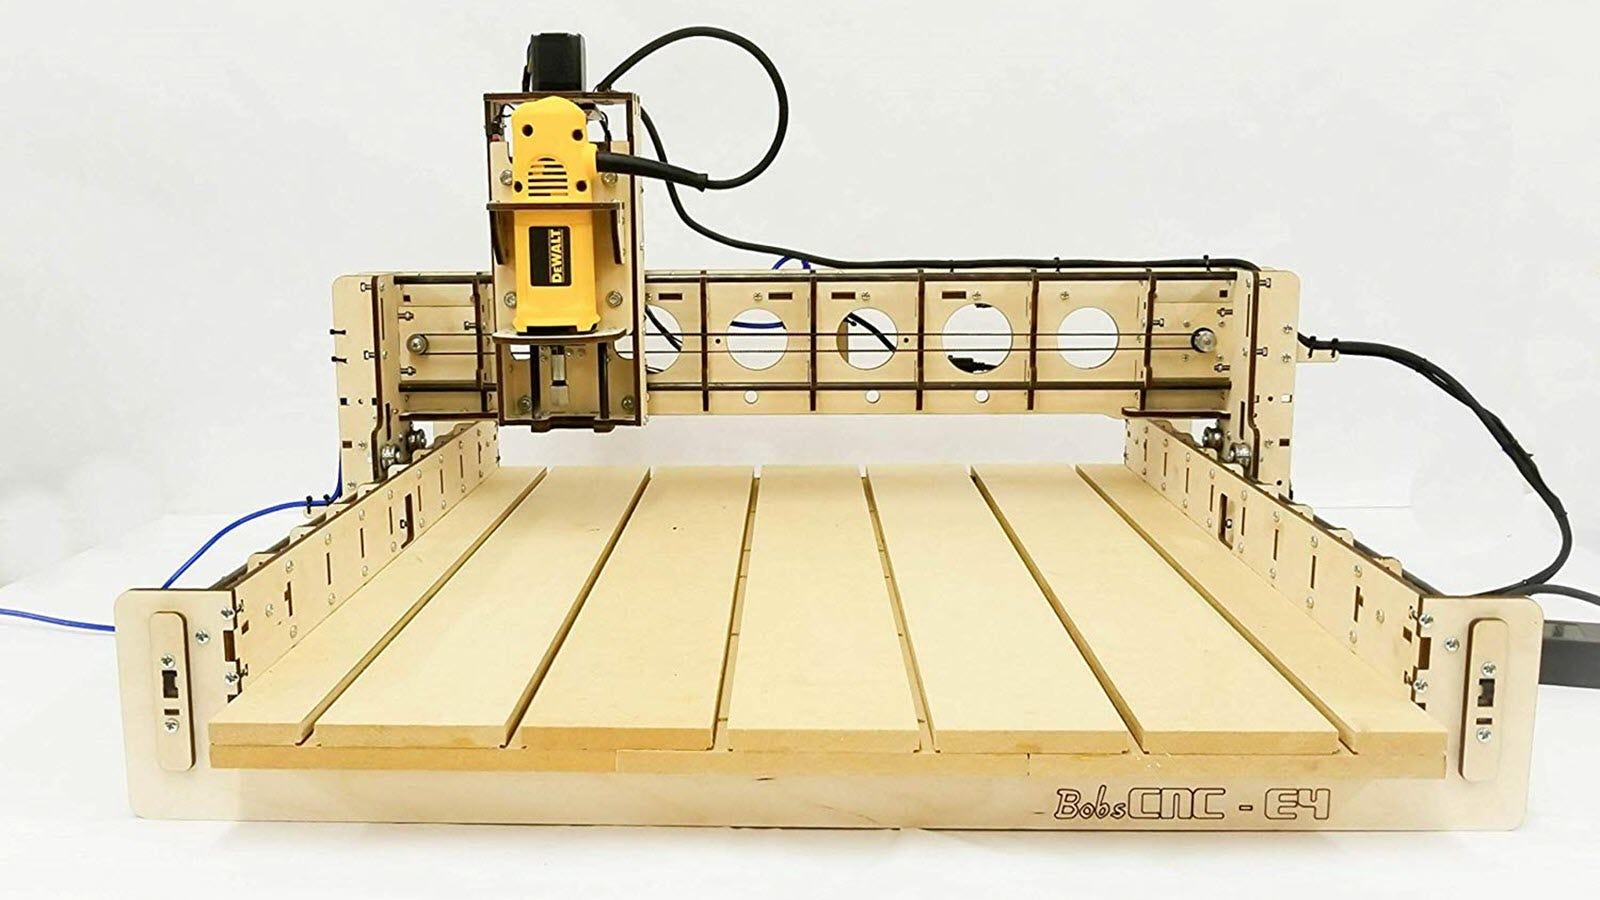 A BobsCNC E4 CNC machine featuring a yellow DeWalt router.